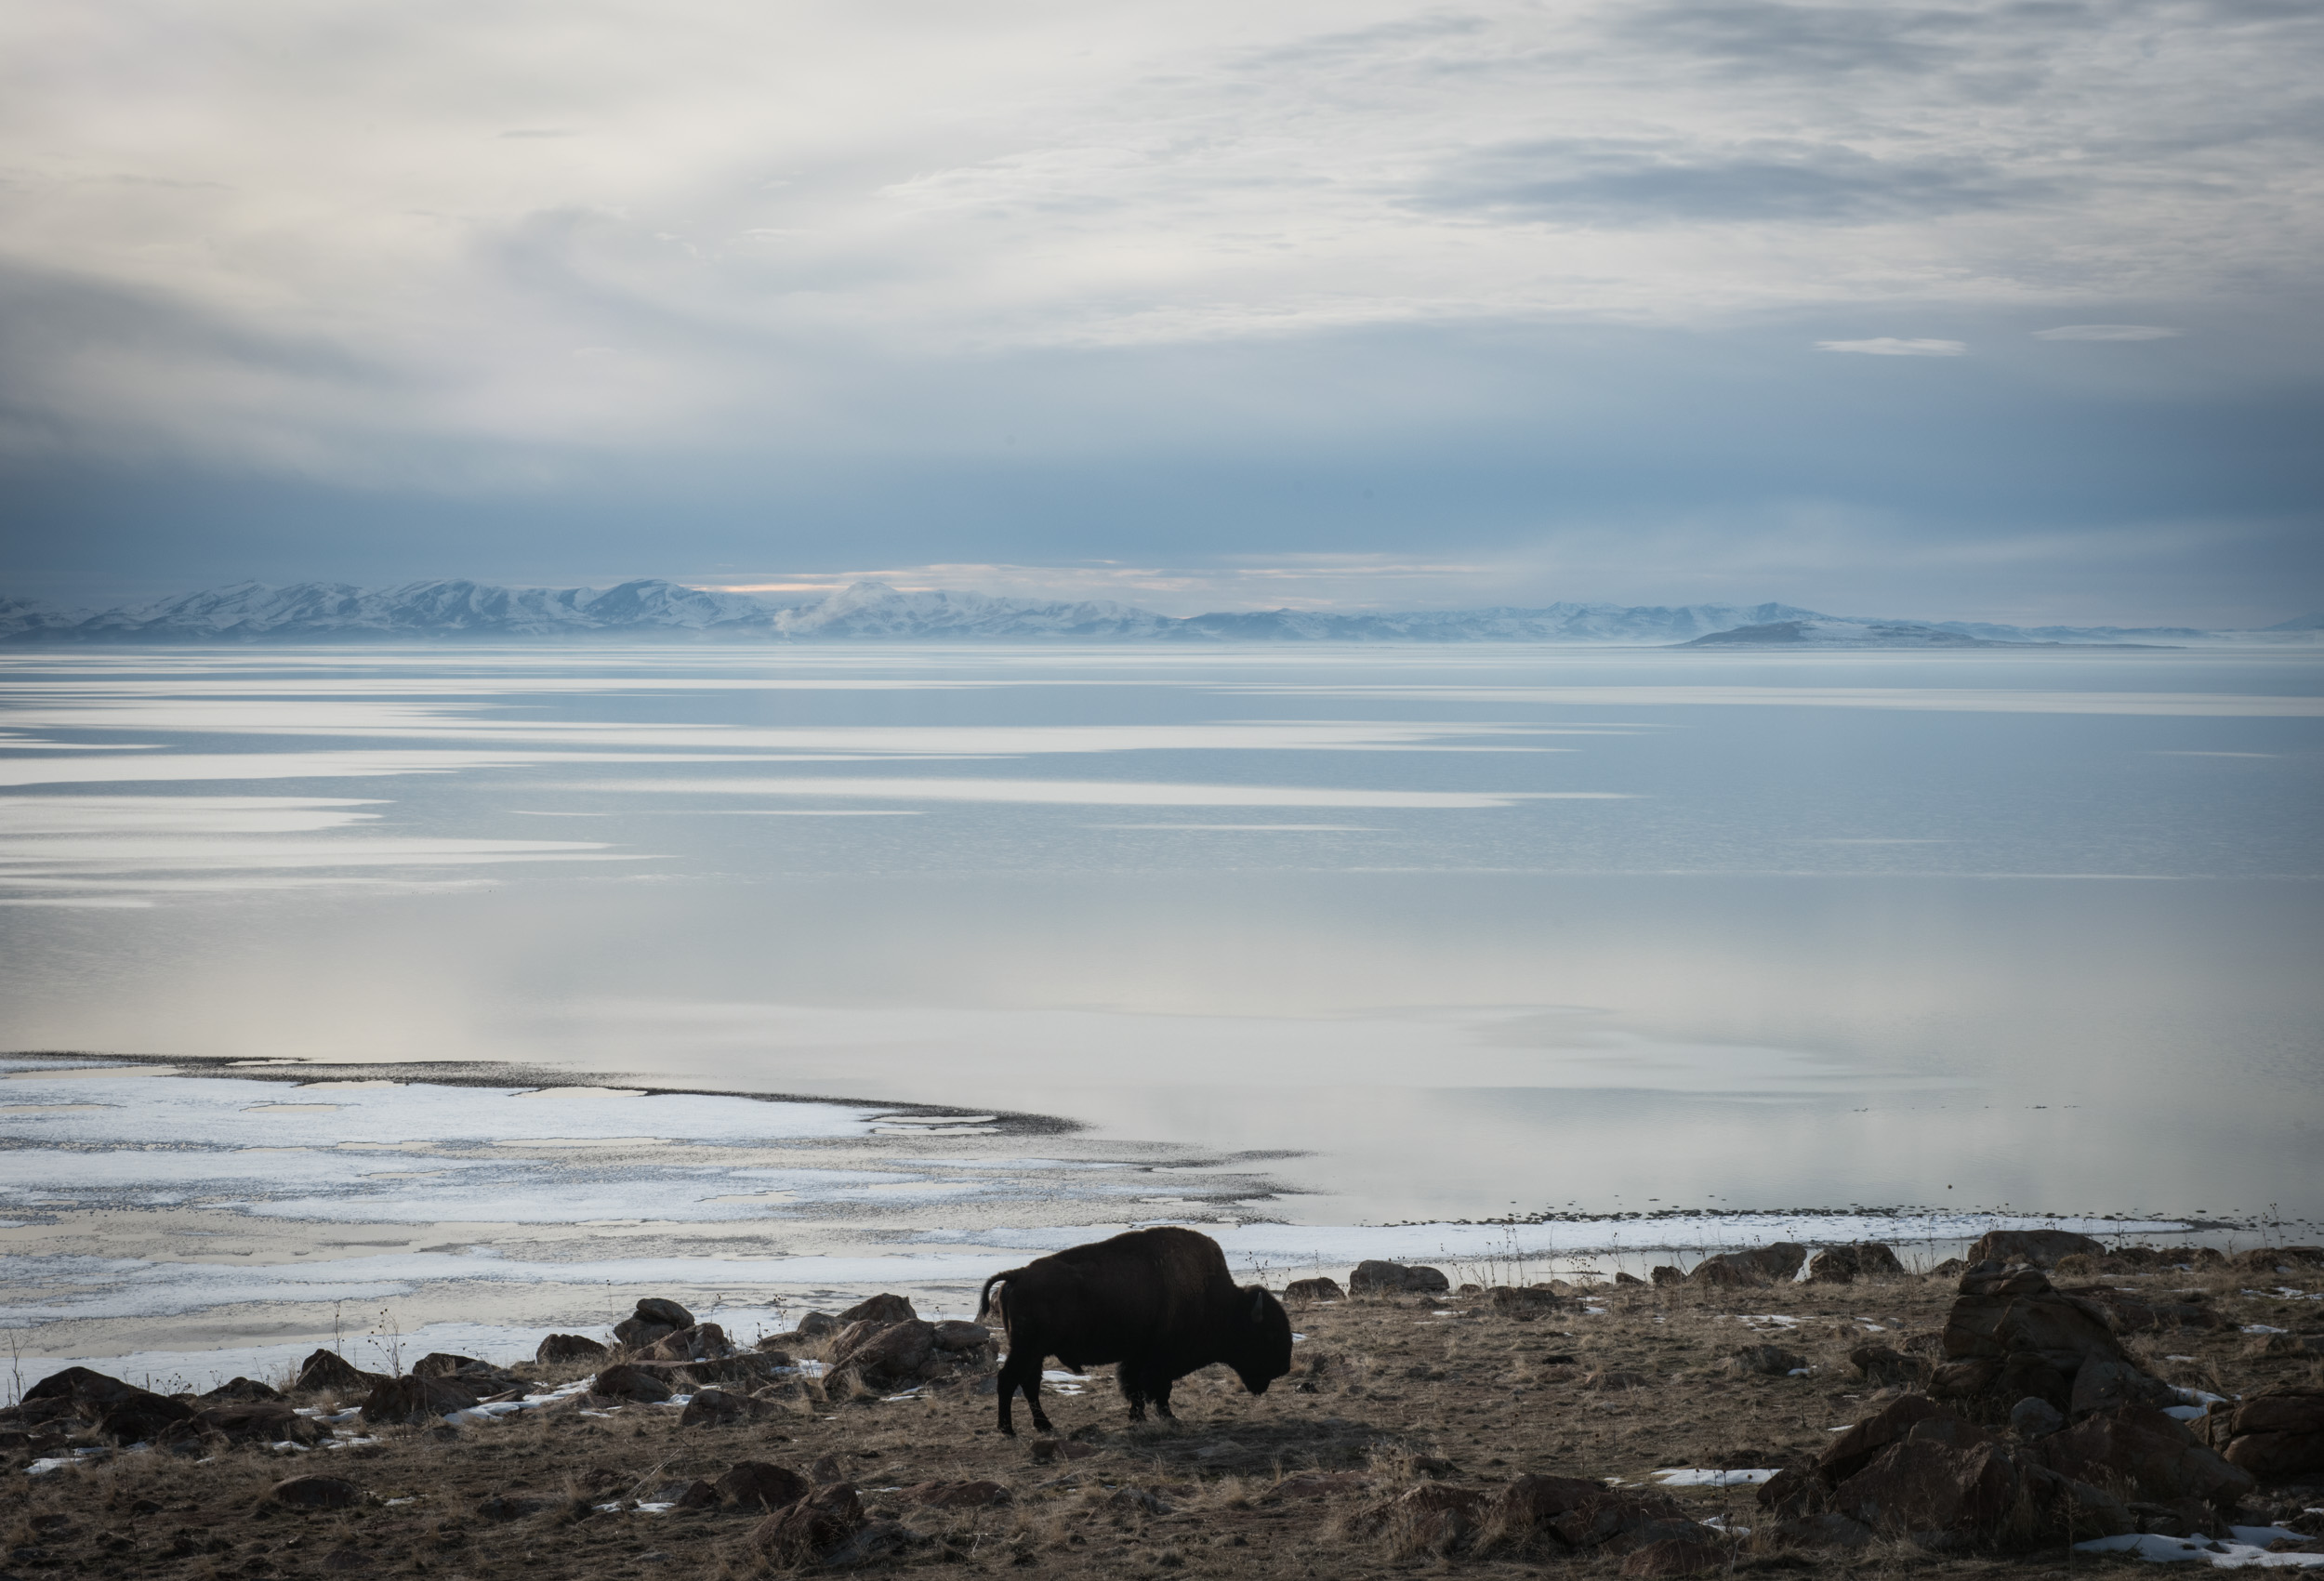 A bison grazing at Antelope Island State Park at the Great Salt Lake, Utah.